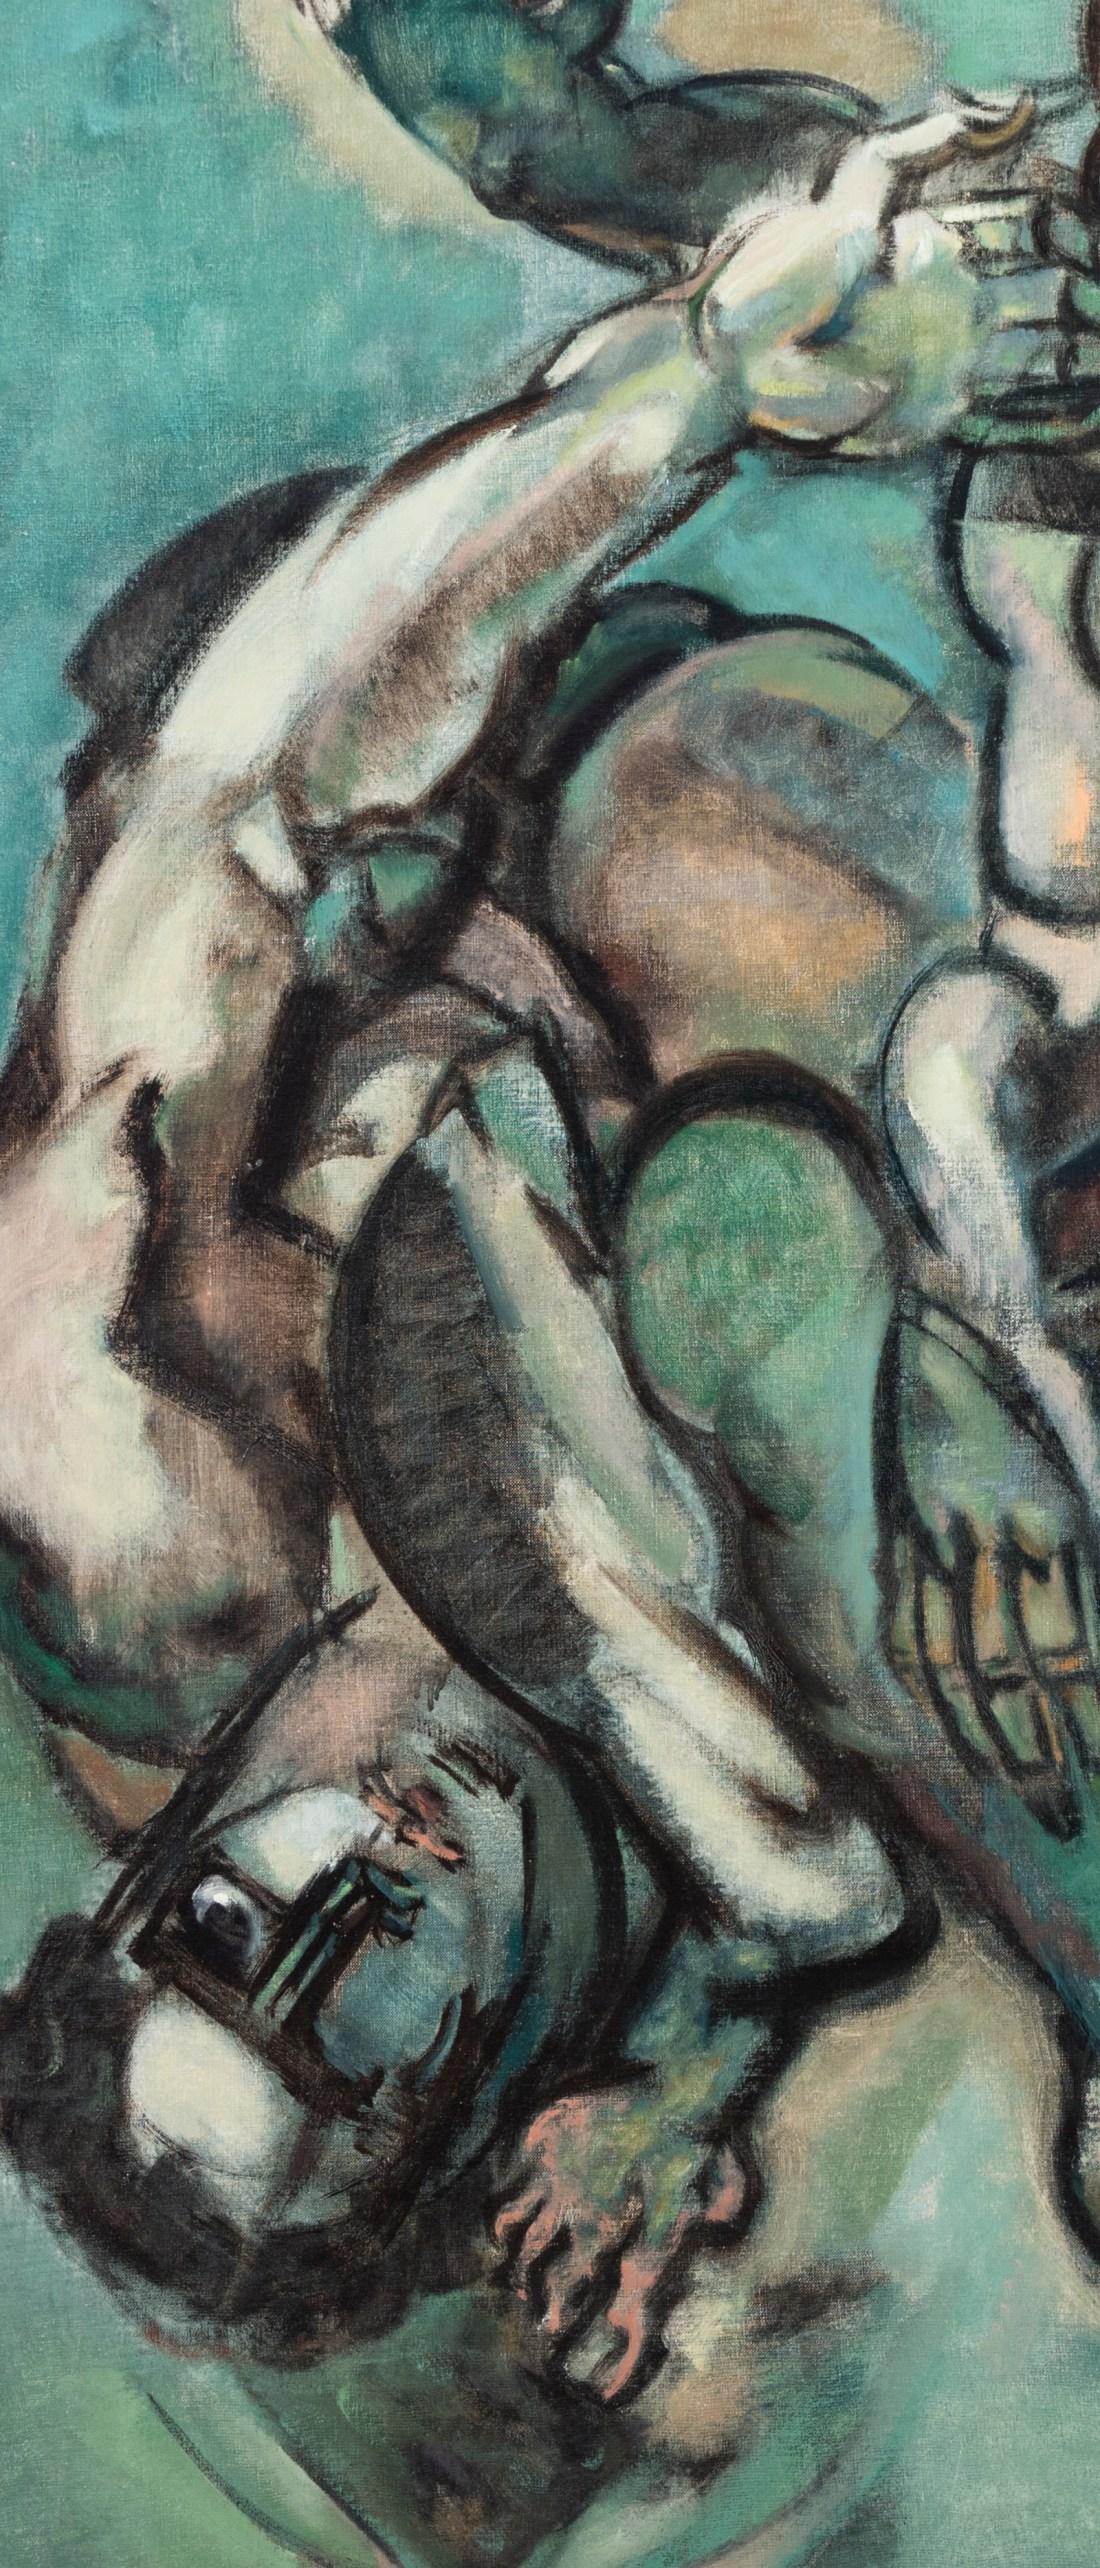 Art, American Painting, 20th century Art, Old Testament Art